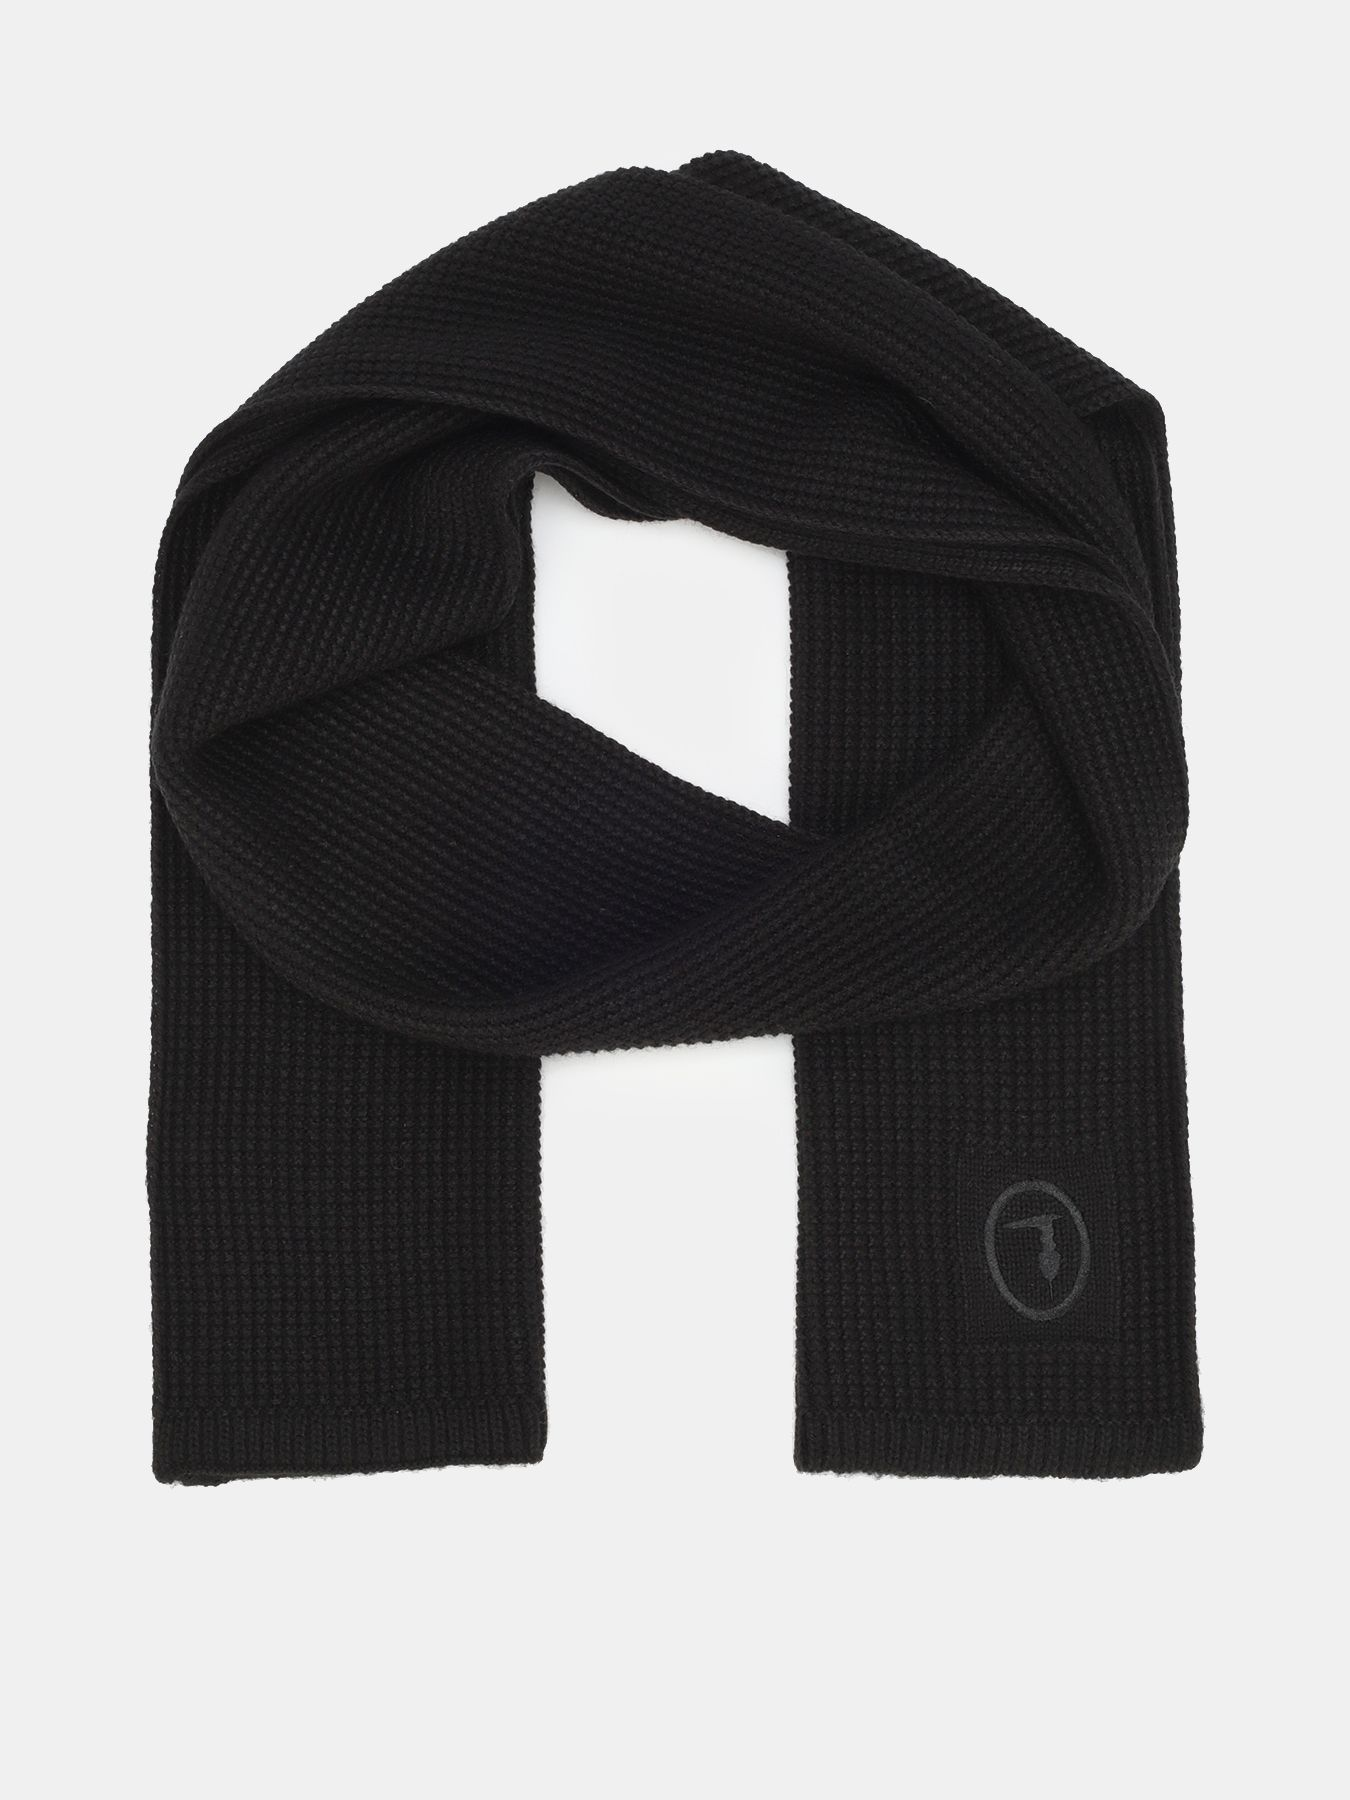 шарфы trussardi шарф Шарфы Trussardi Шарф